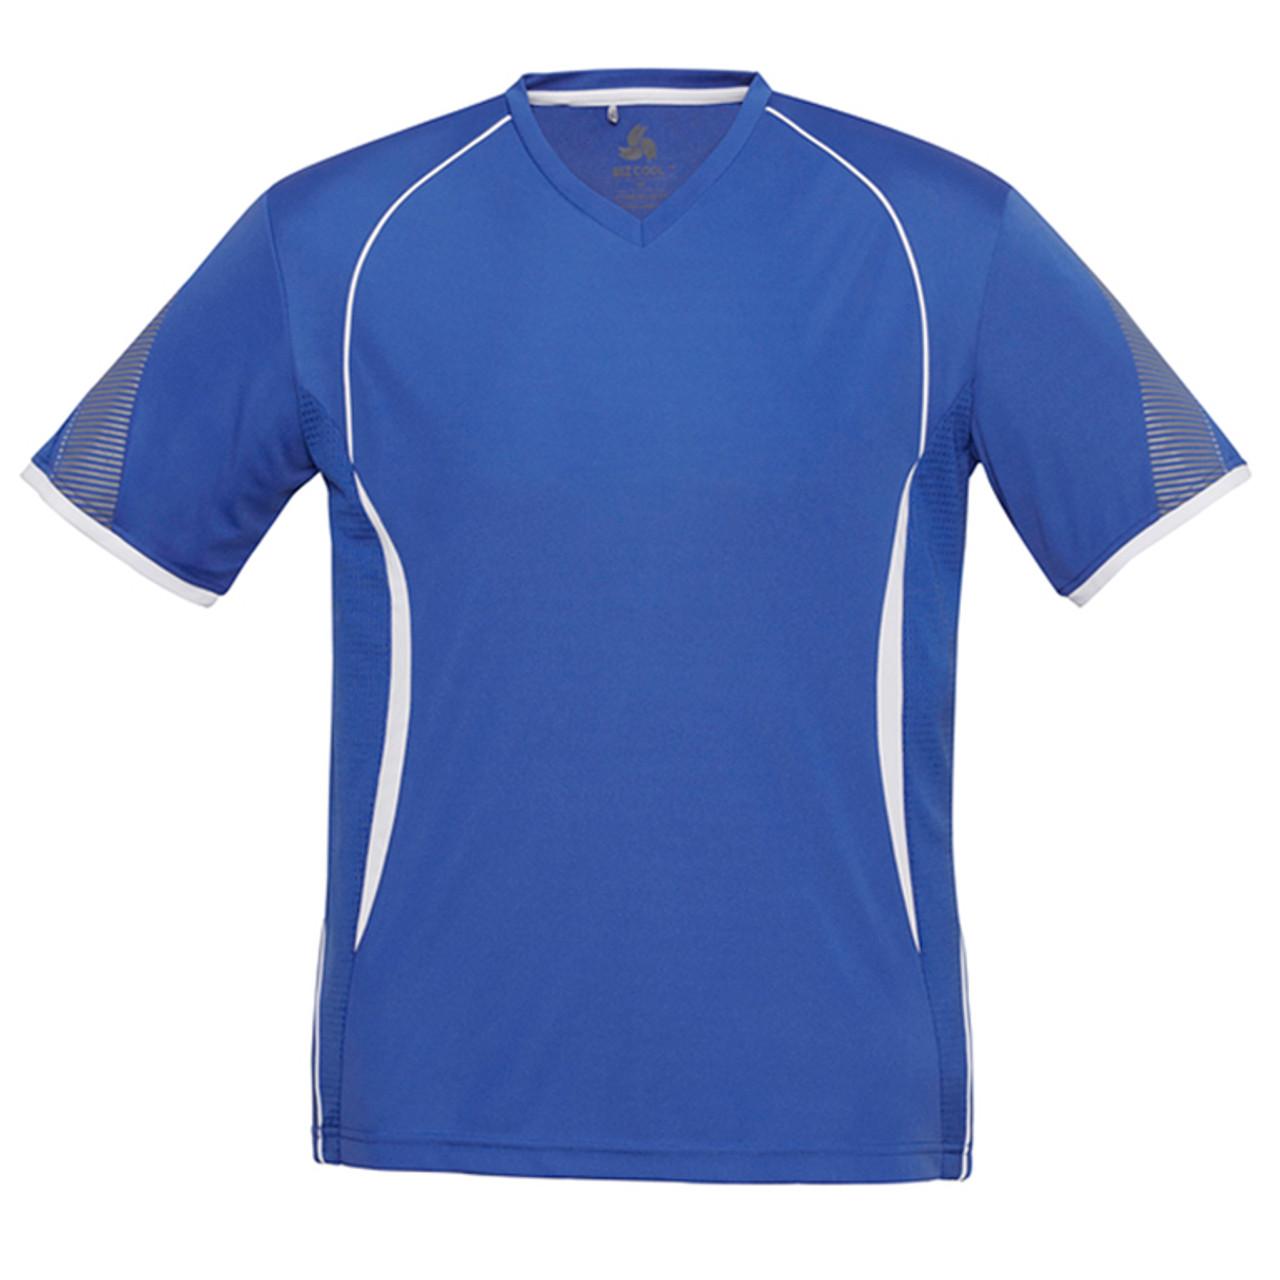 Gilbert Vapour Tee T-Shirt Mens Sports rugby white Crew Neck Top mens medium